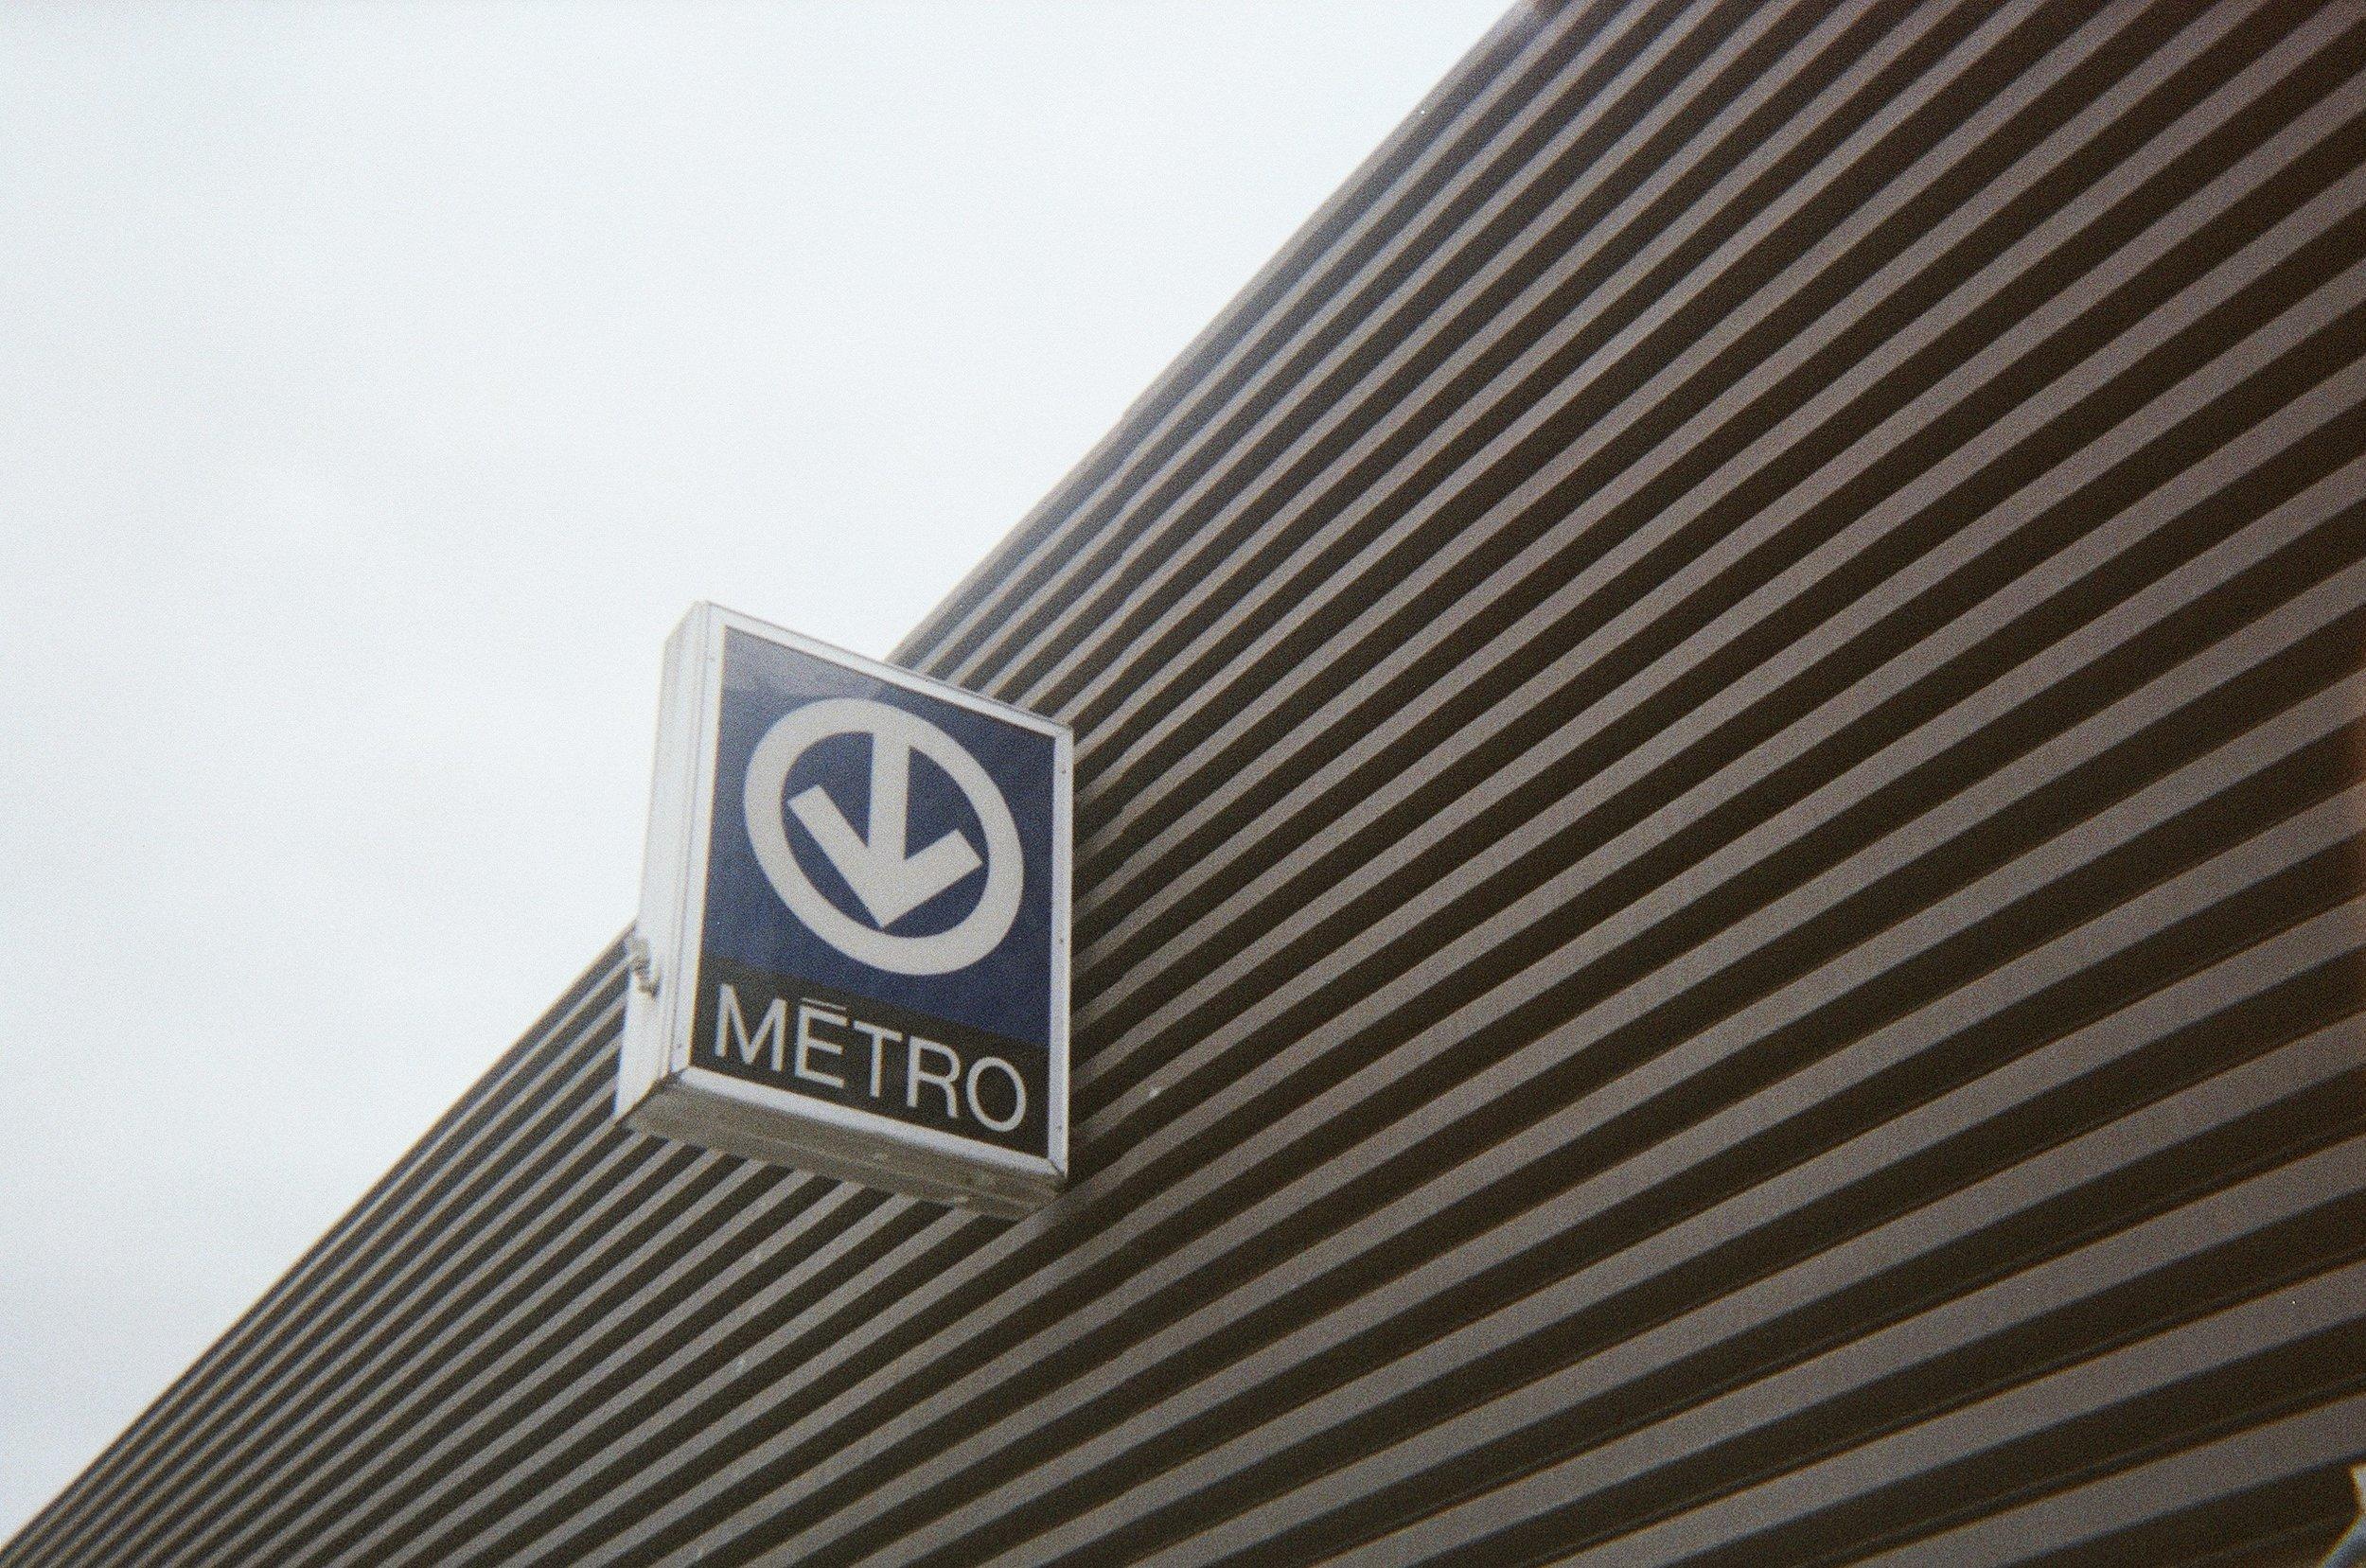 Metro-linear